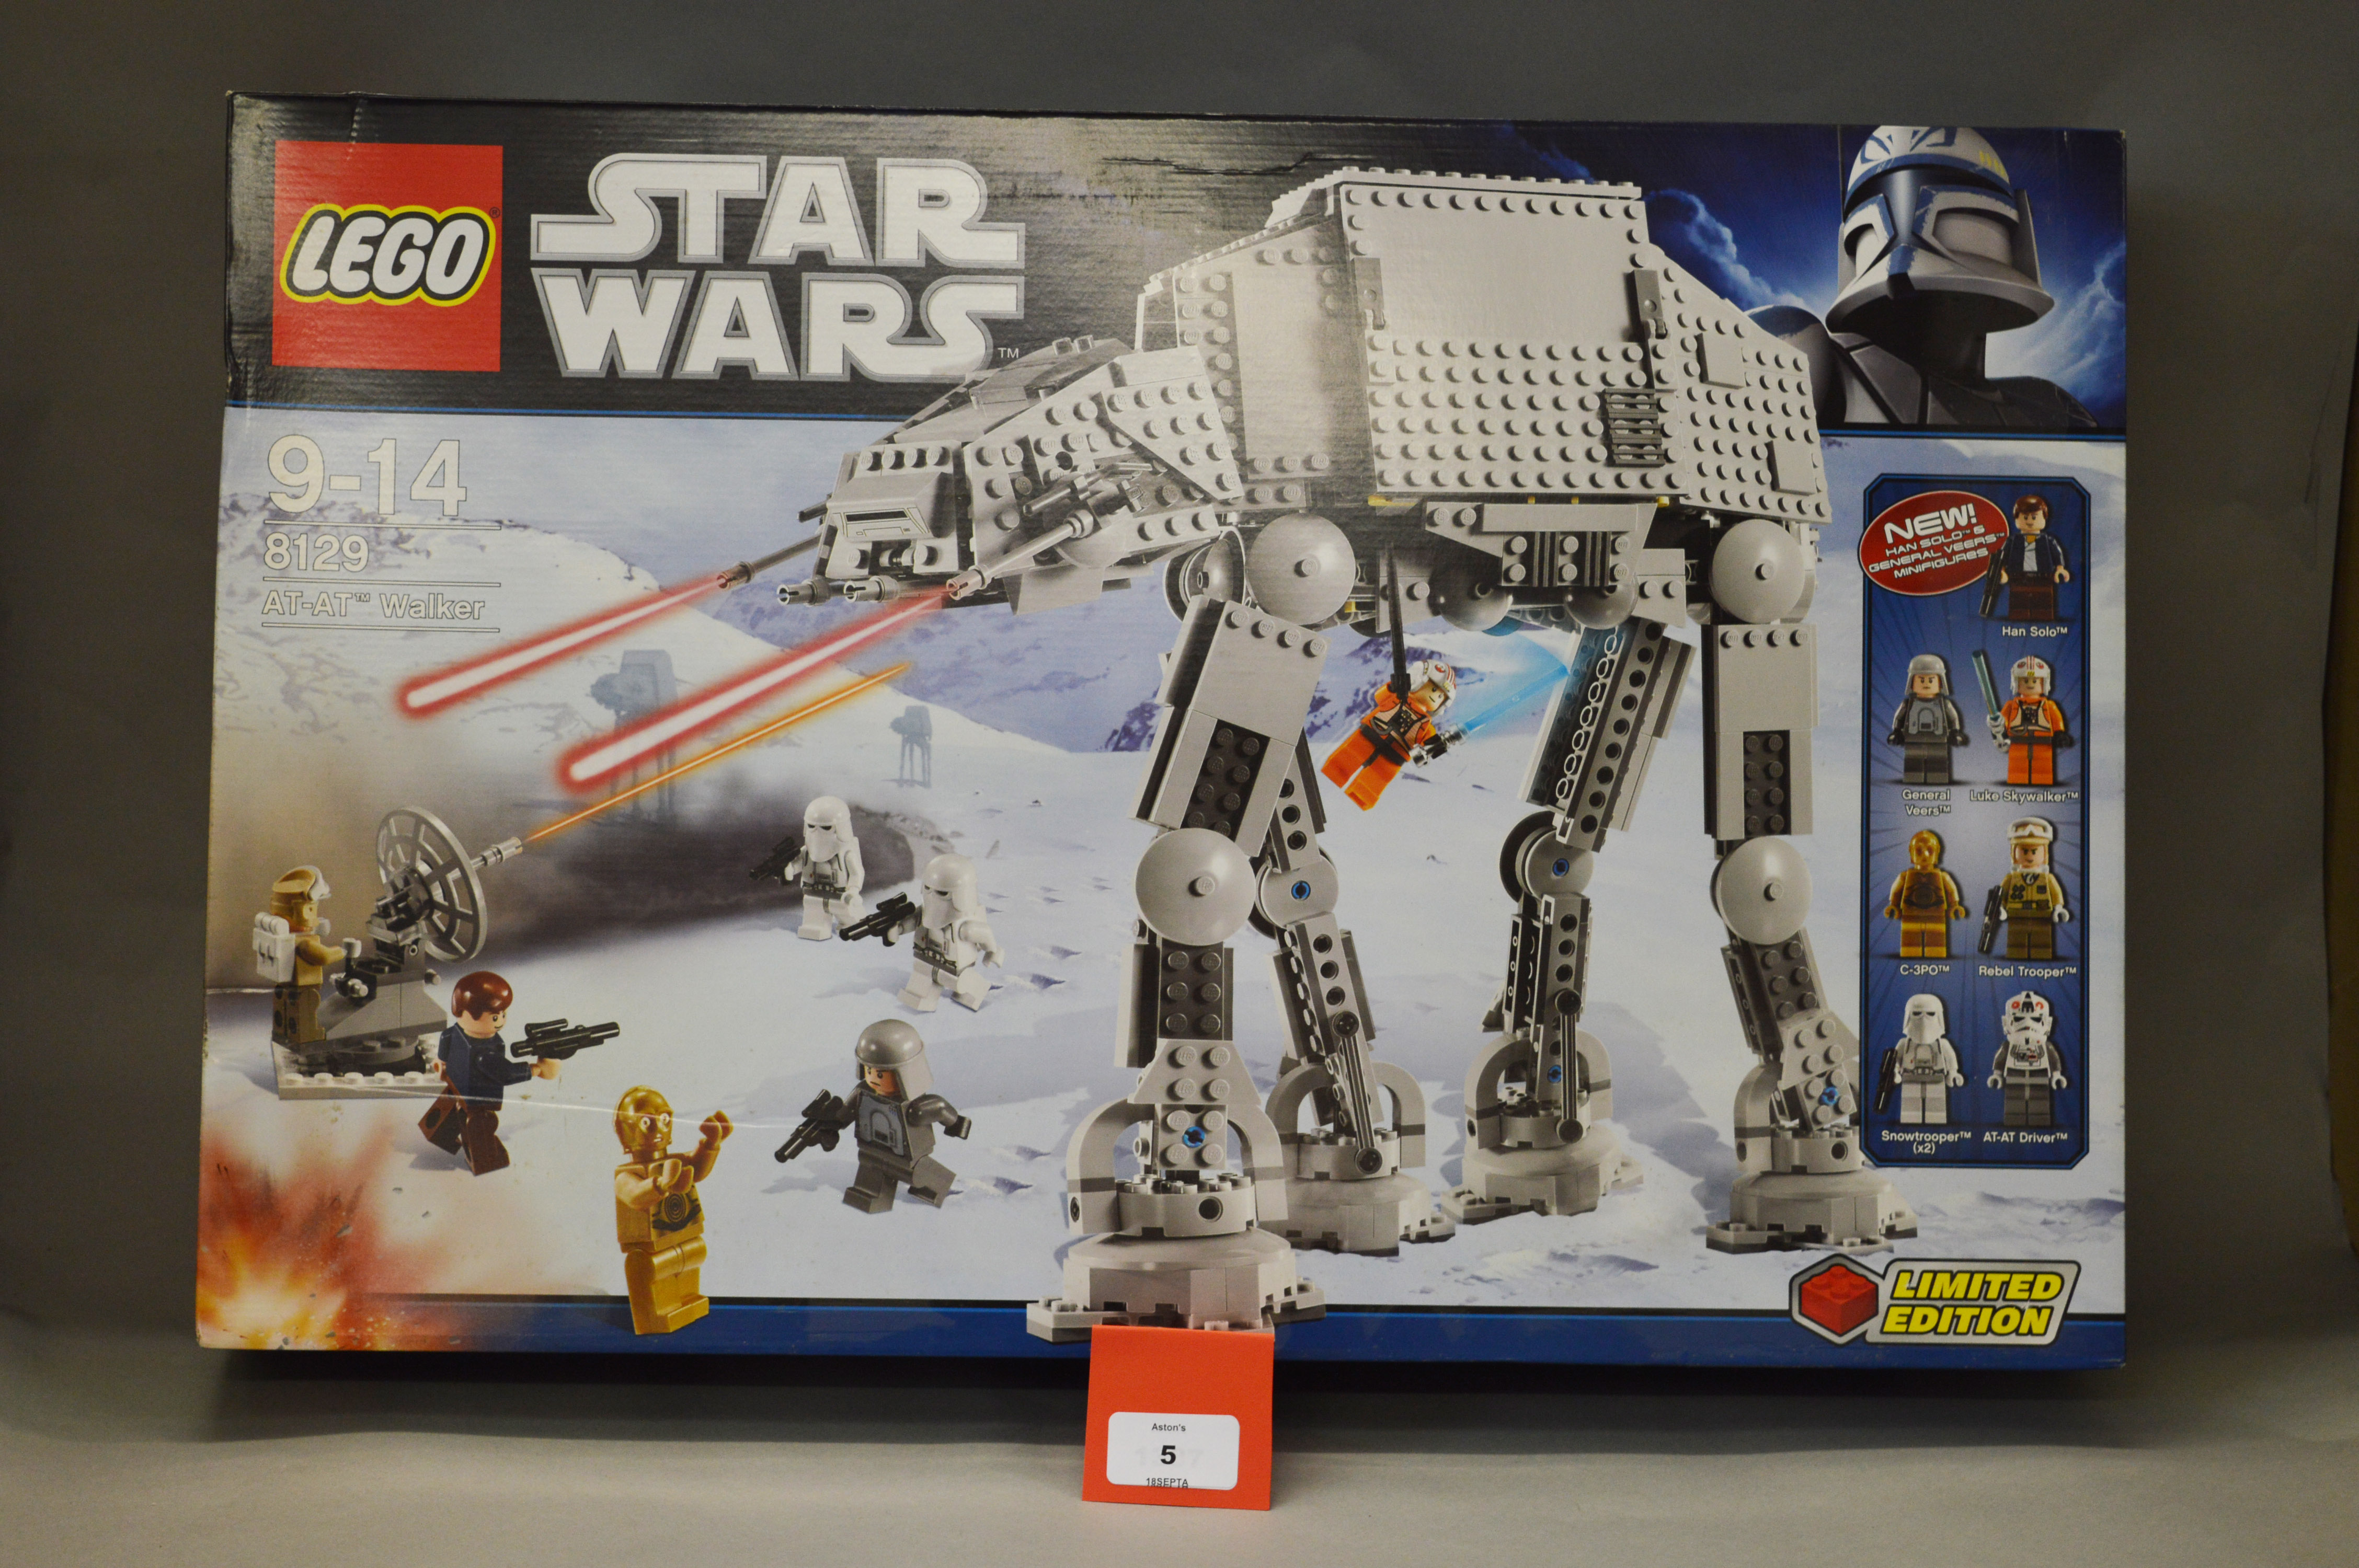 Lot 5 - Lego Star Wars 8129 AT-AT Walker. Sealed (one security seal part split).